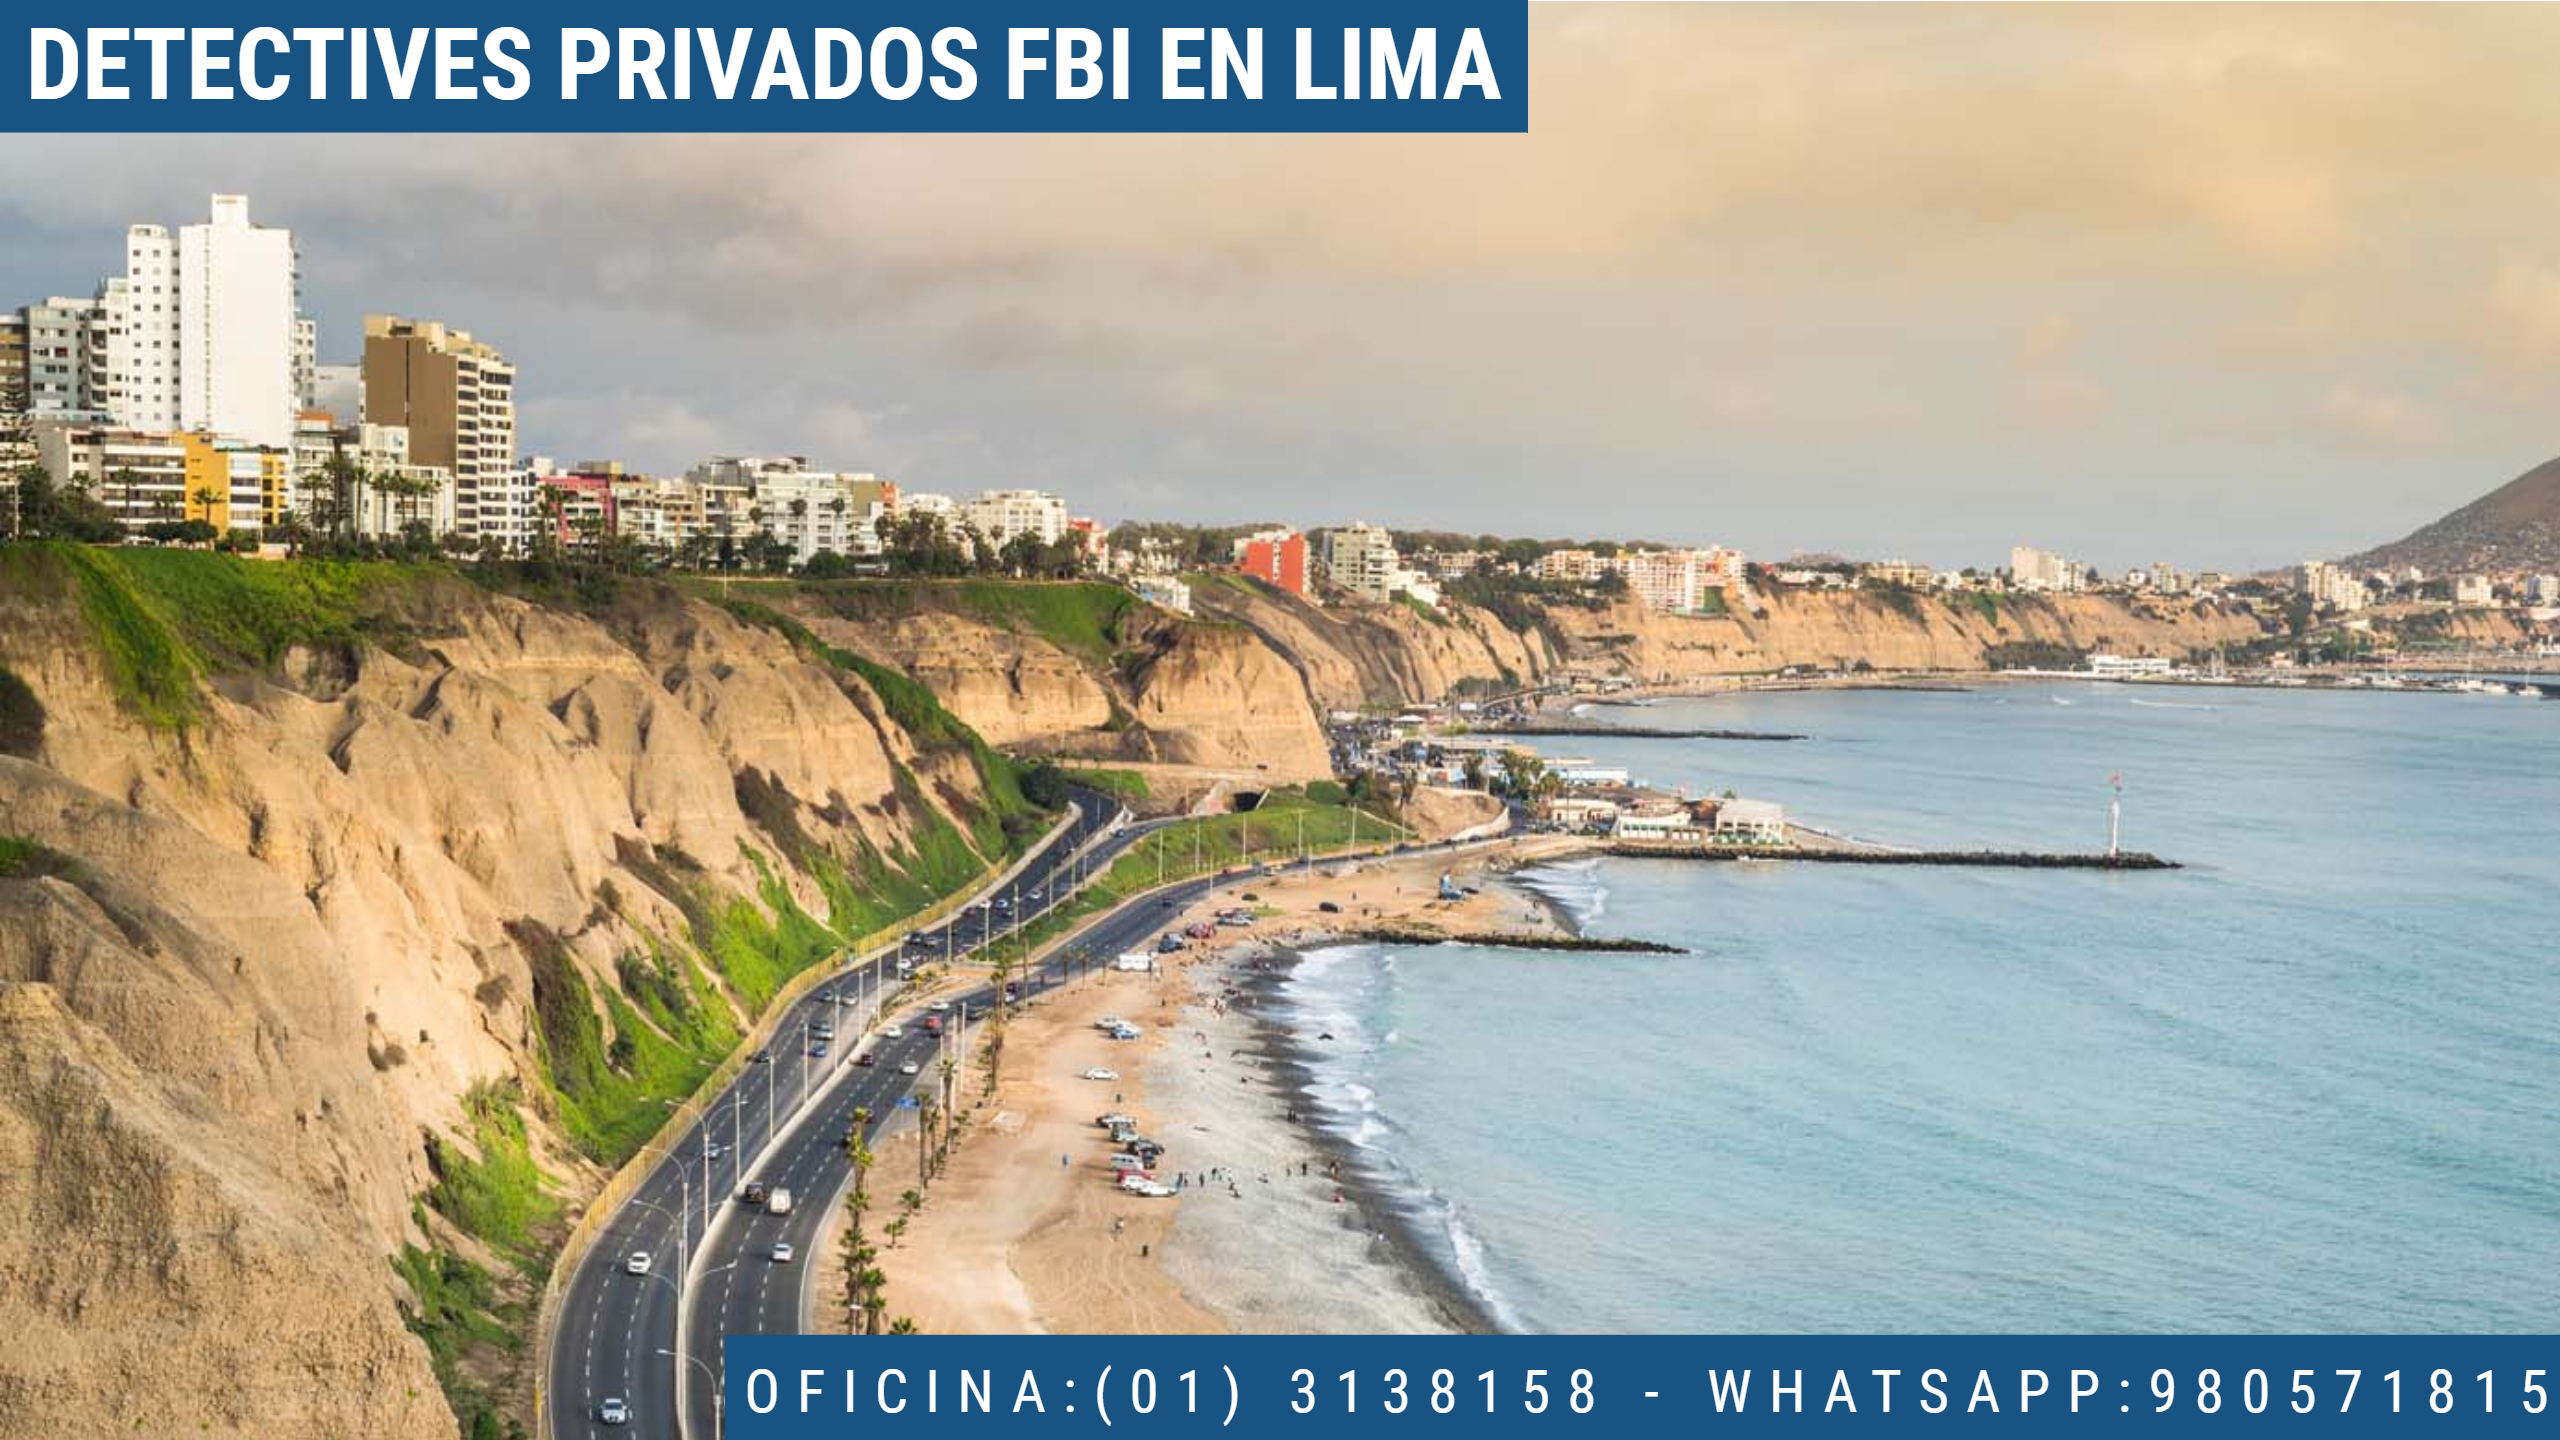 INVESTIGACIÓN PRIVADA FBI EN LIMA - PERU